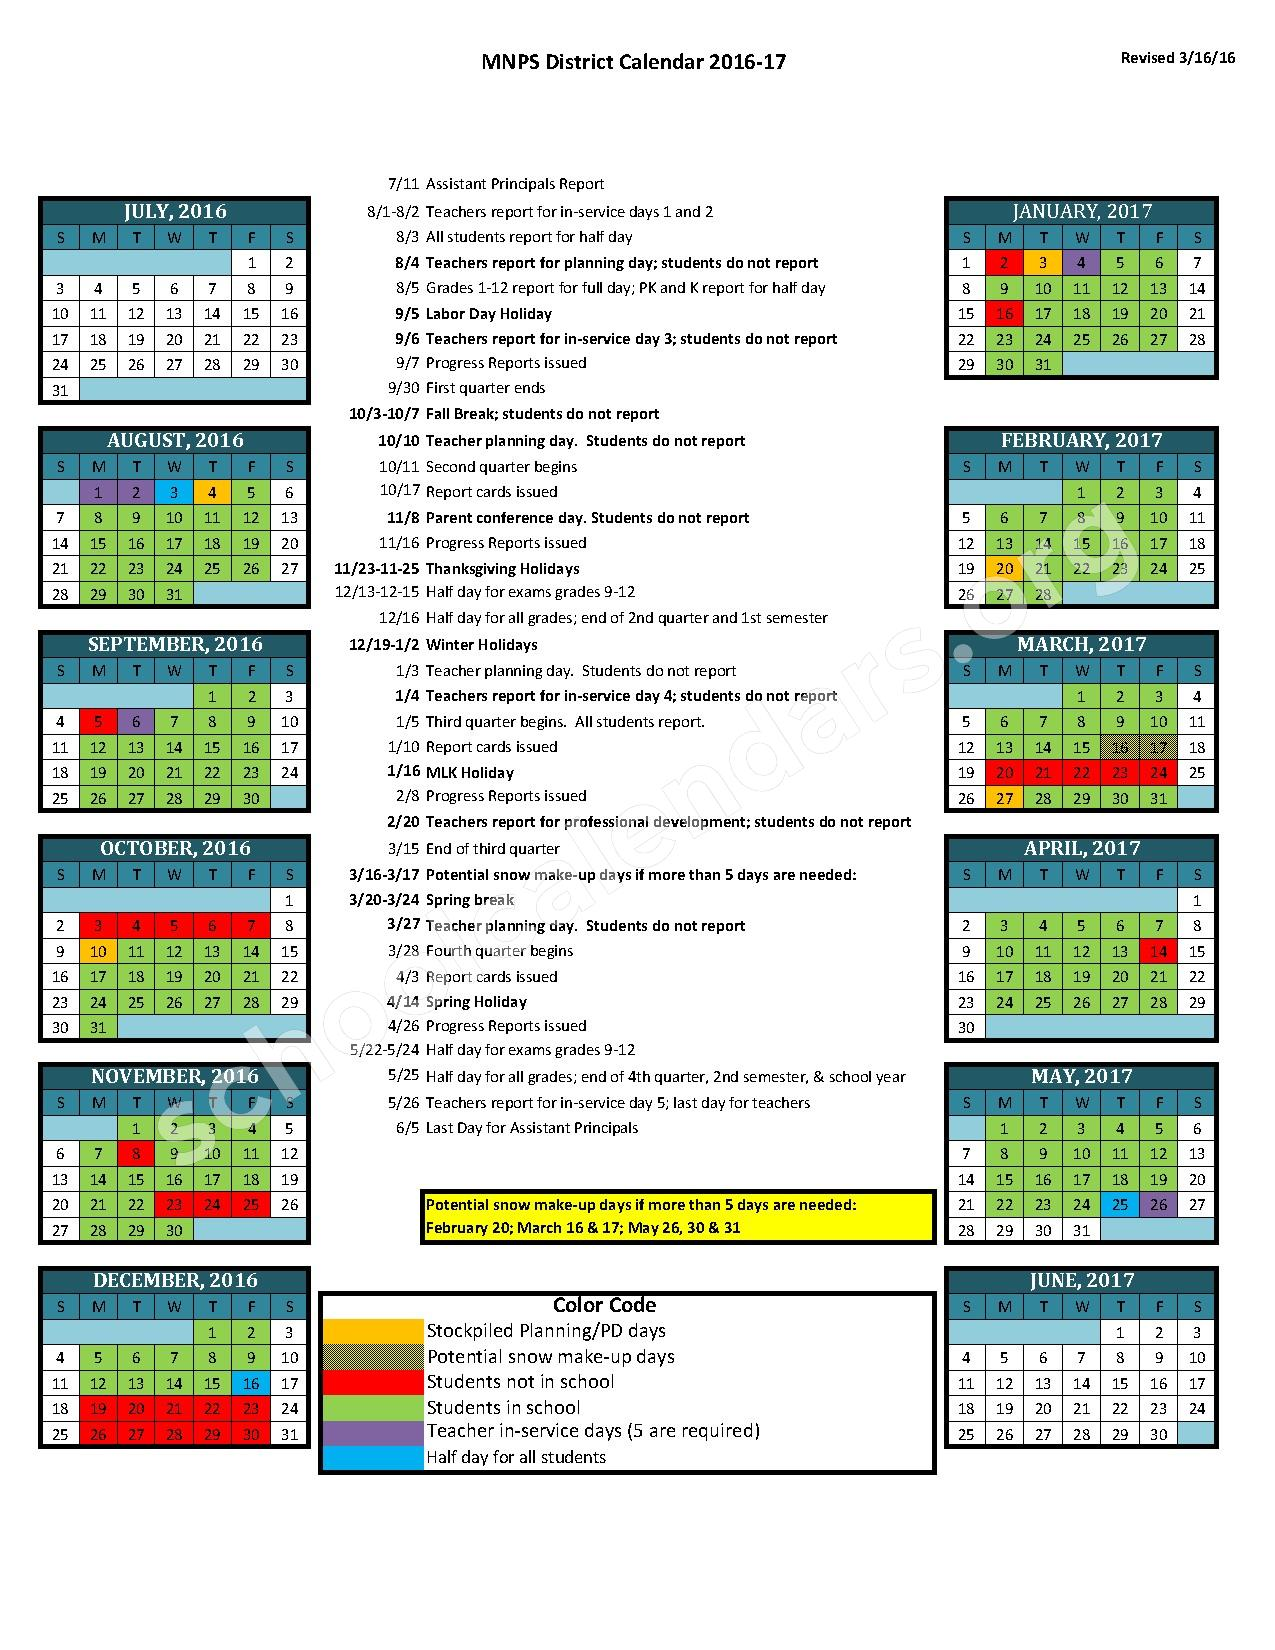 APPROVED: 2017 18 District Calendar — Metro Nashville Public Schools